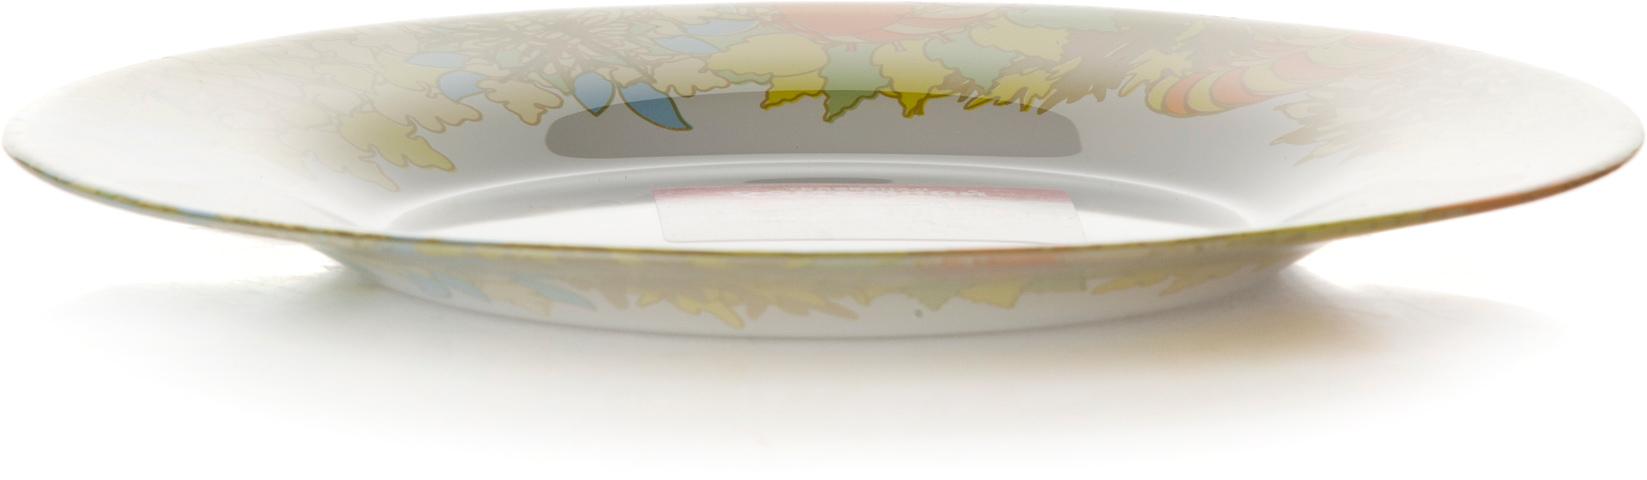 Тарелка Pasabahce Семья. Домашний, цвет: белый, диаметр 19,5 см pasabahce